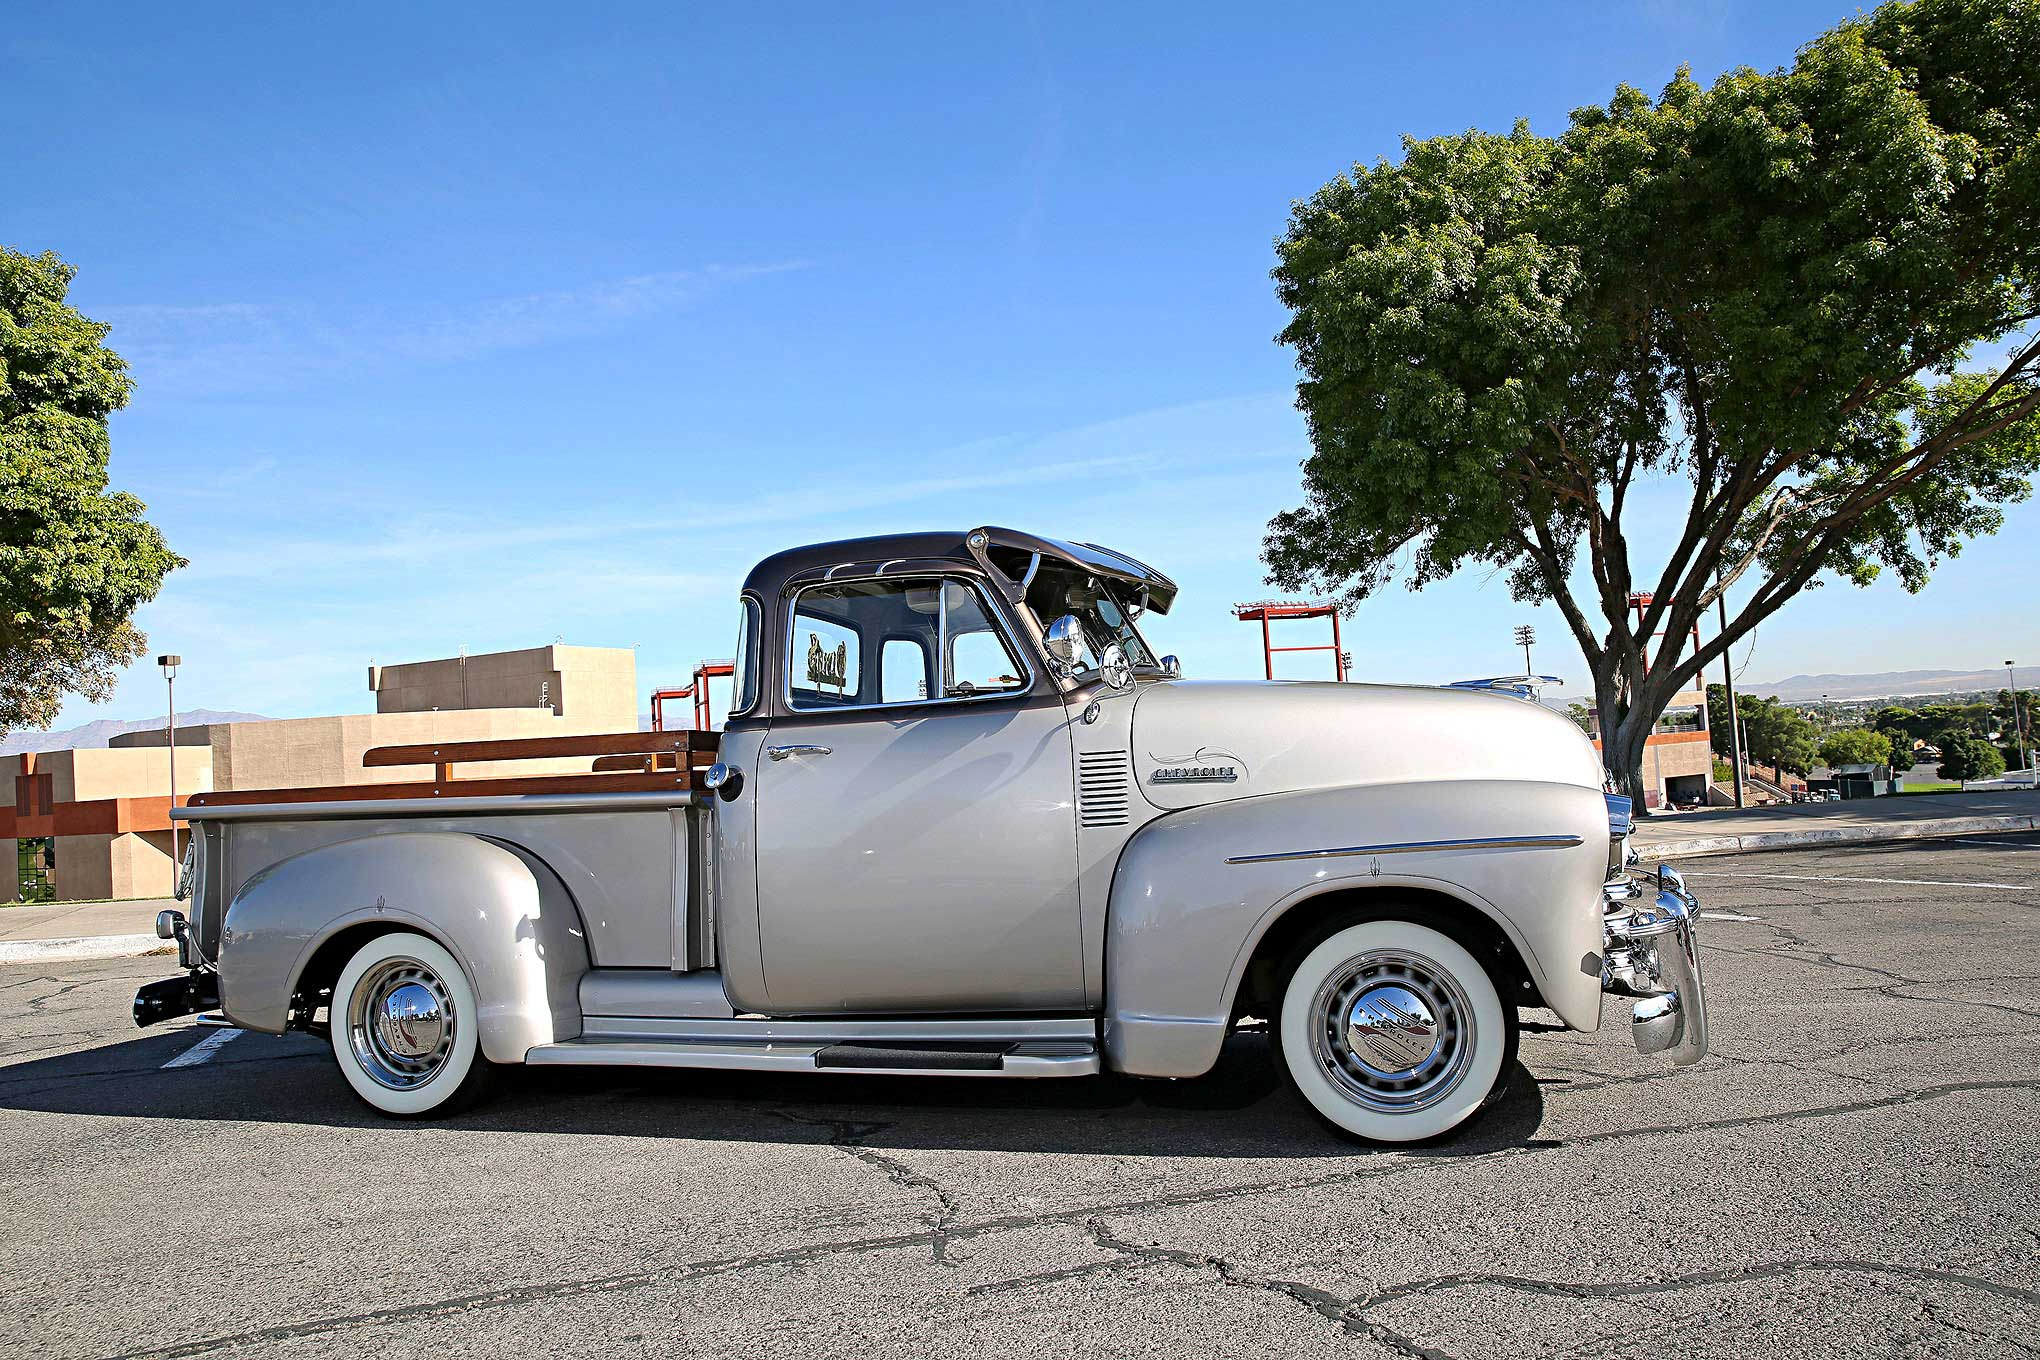 1953 Chevrolet 3100 Priceless Memories